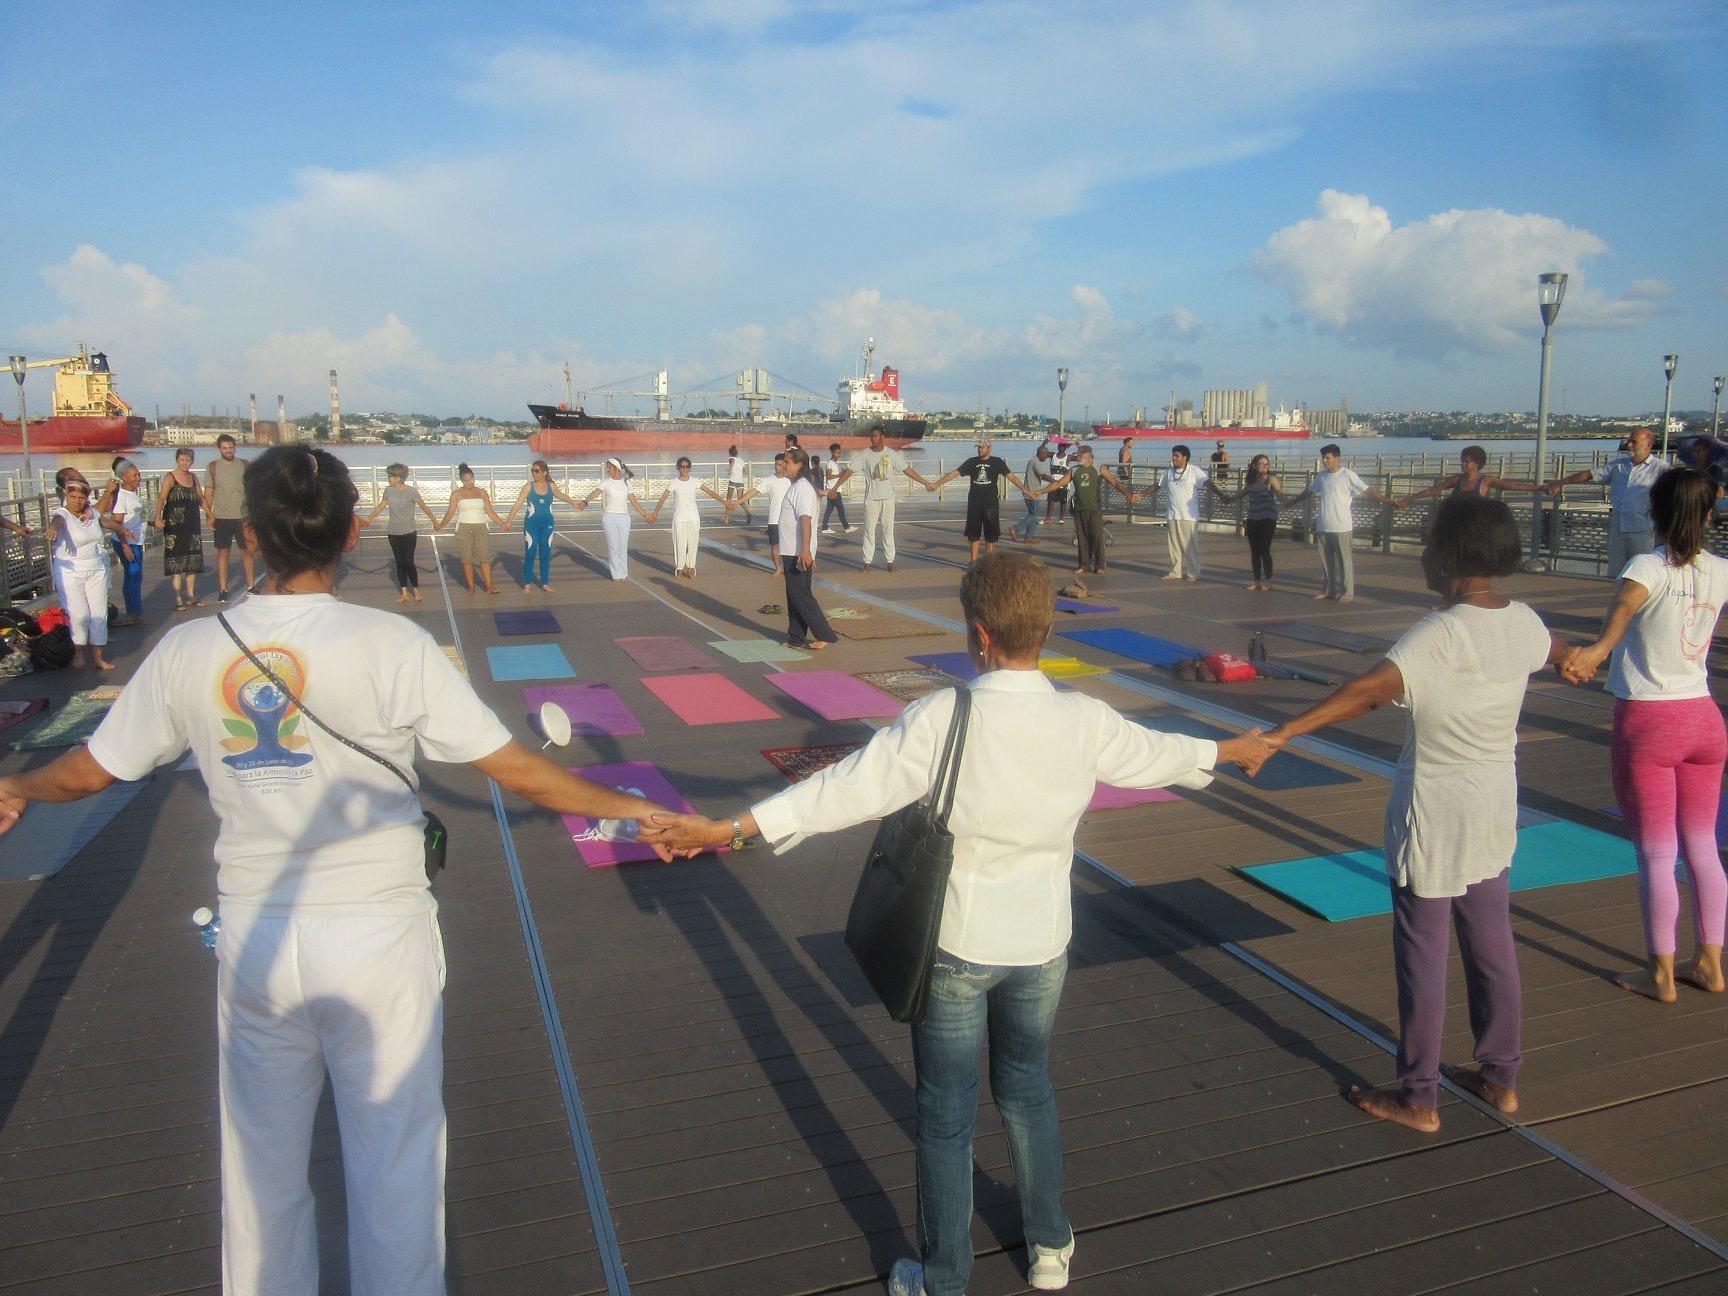 ¡Yoga Va! Cuba organizes the International Day of Yoga 2018, La Habana